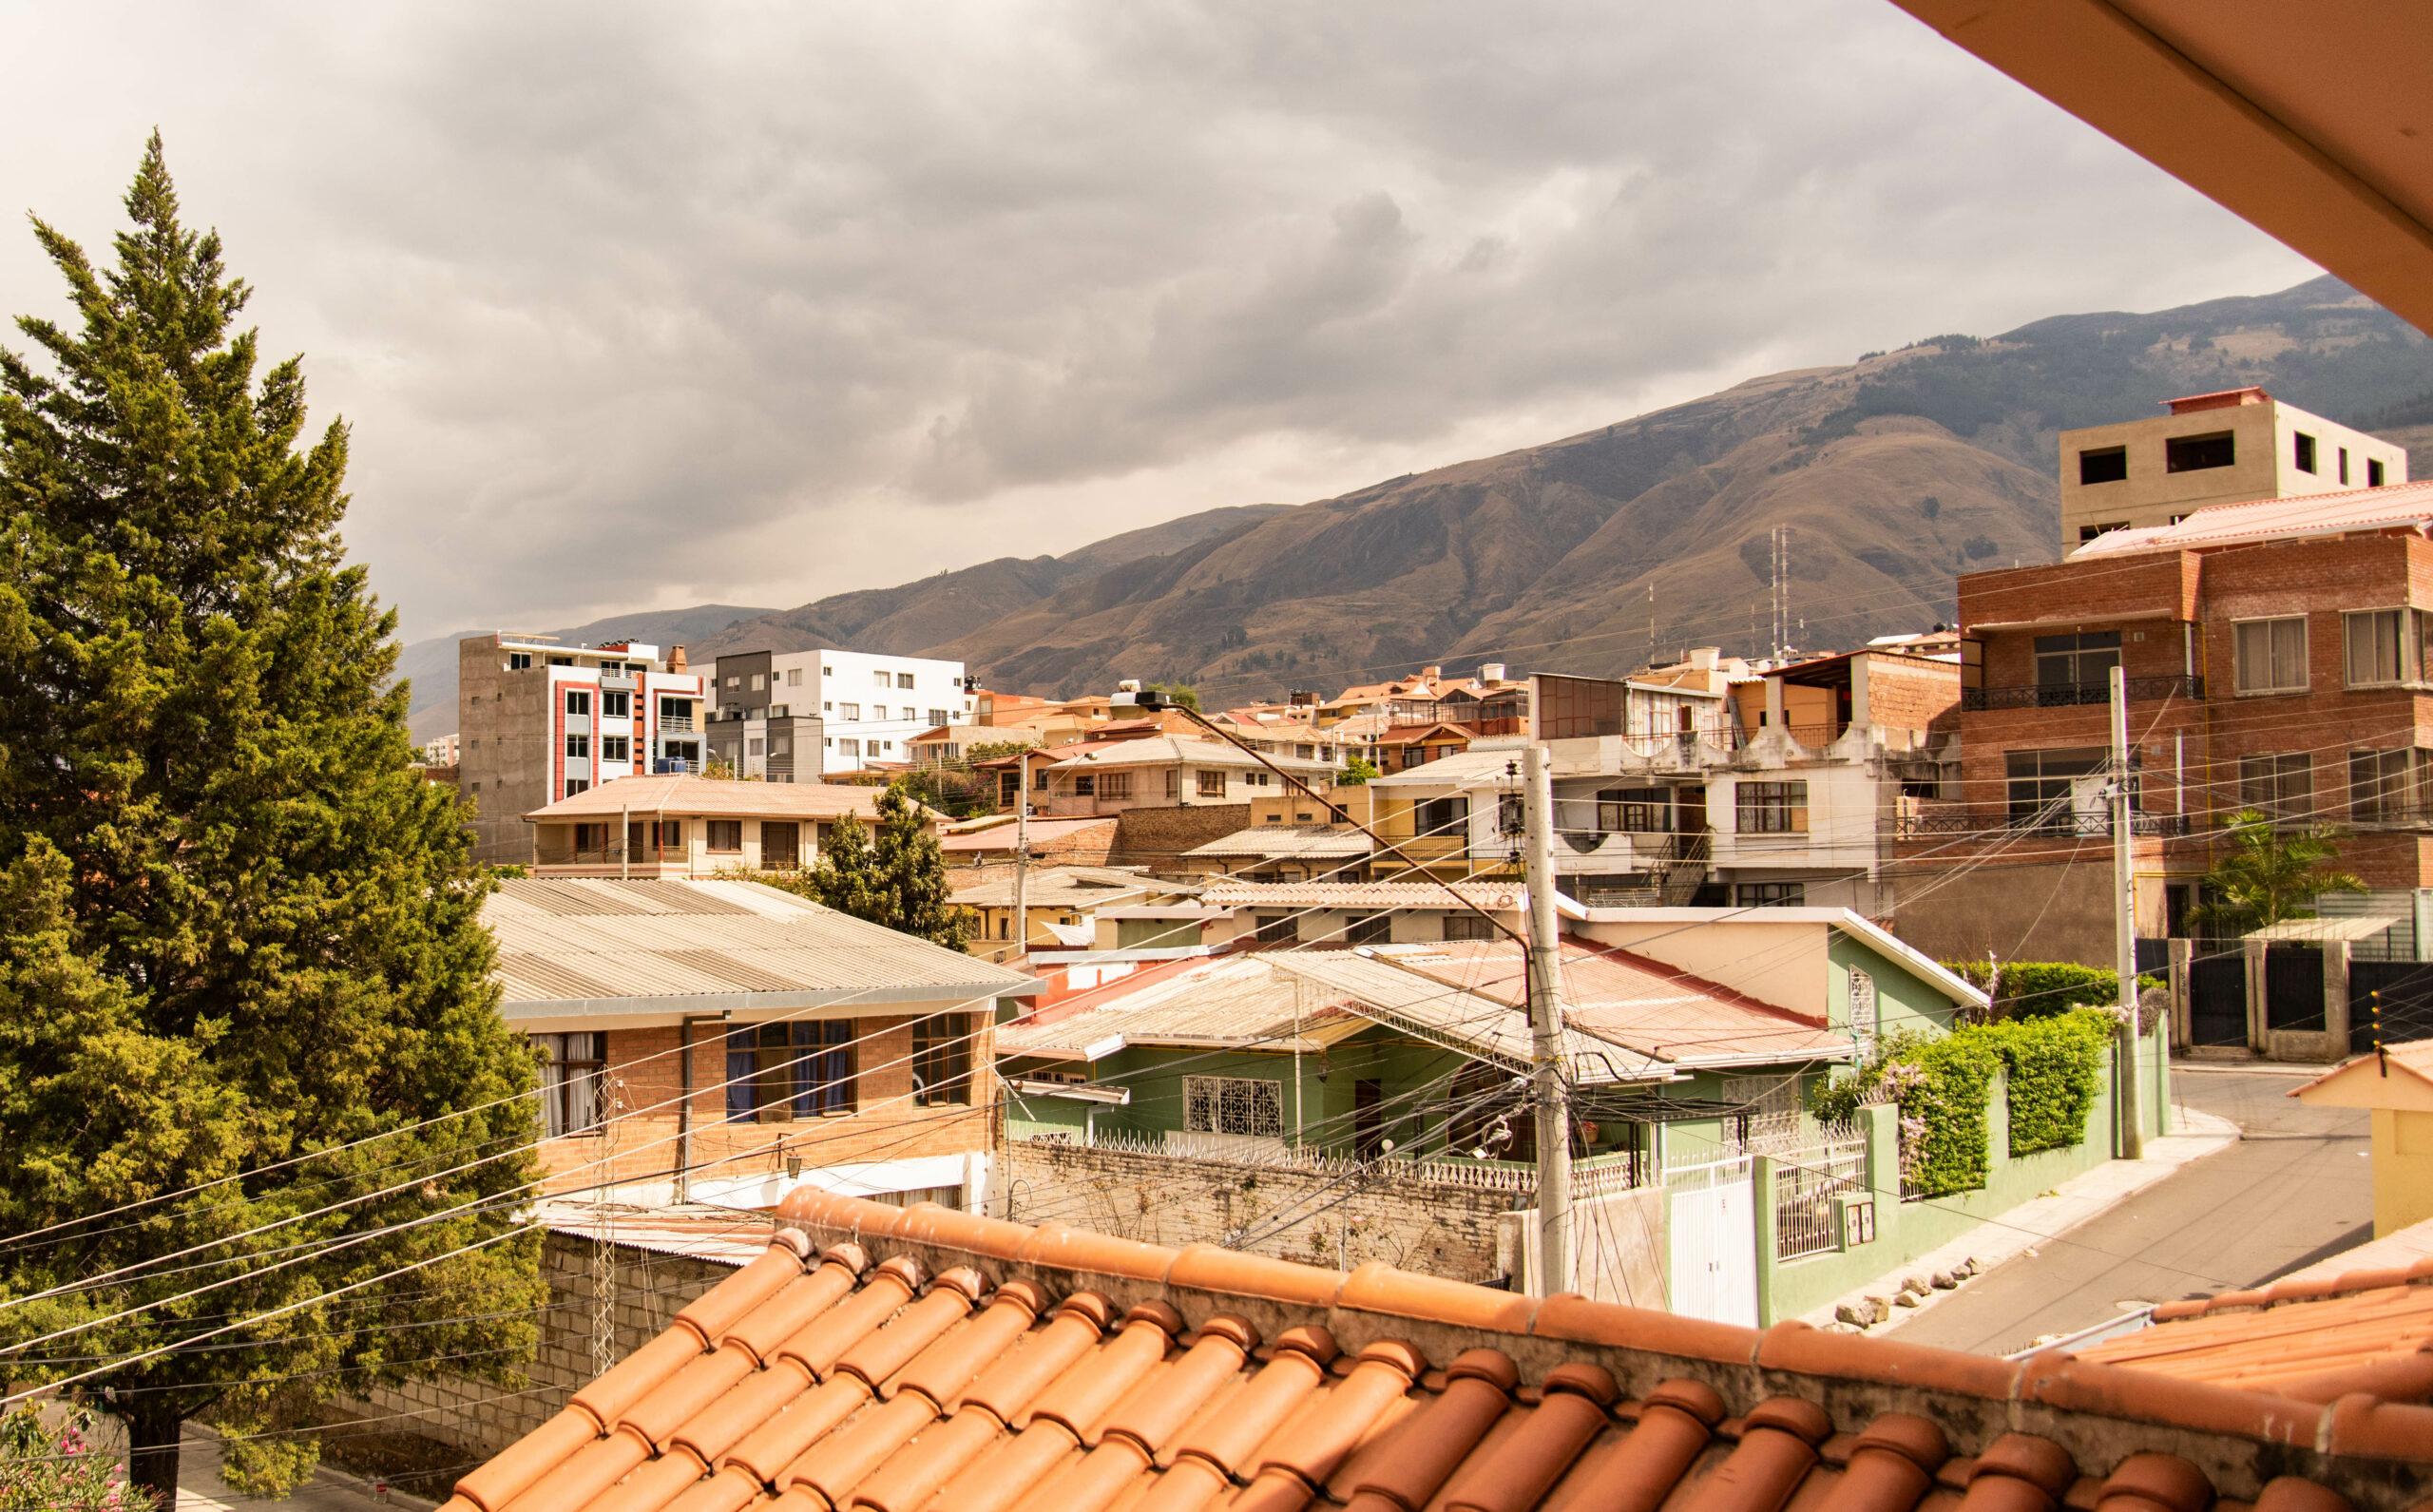 Pancakes and Discipleship: Bolivia